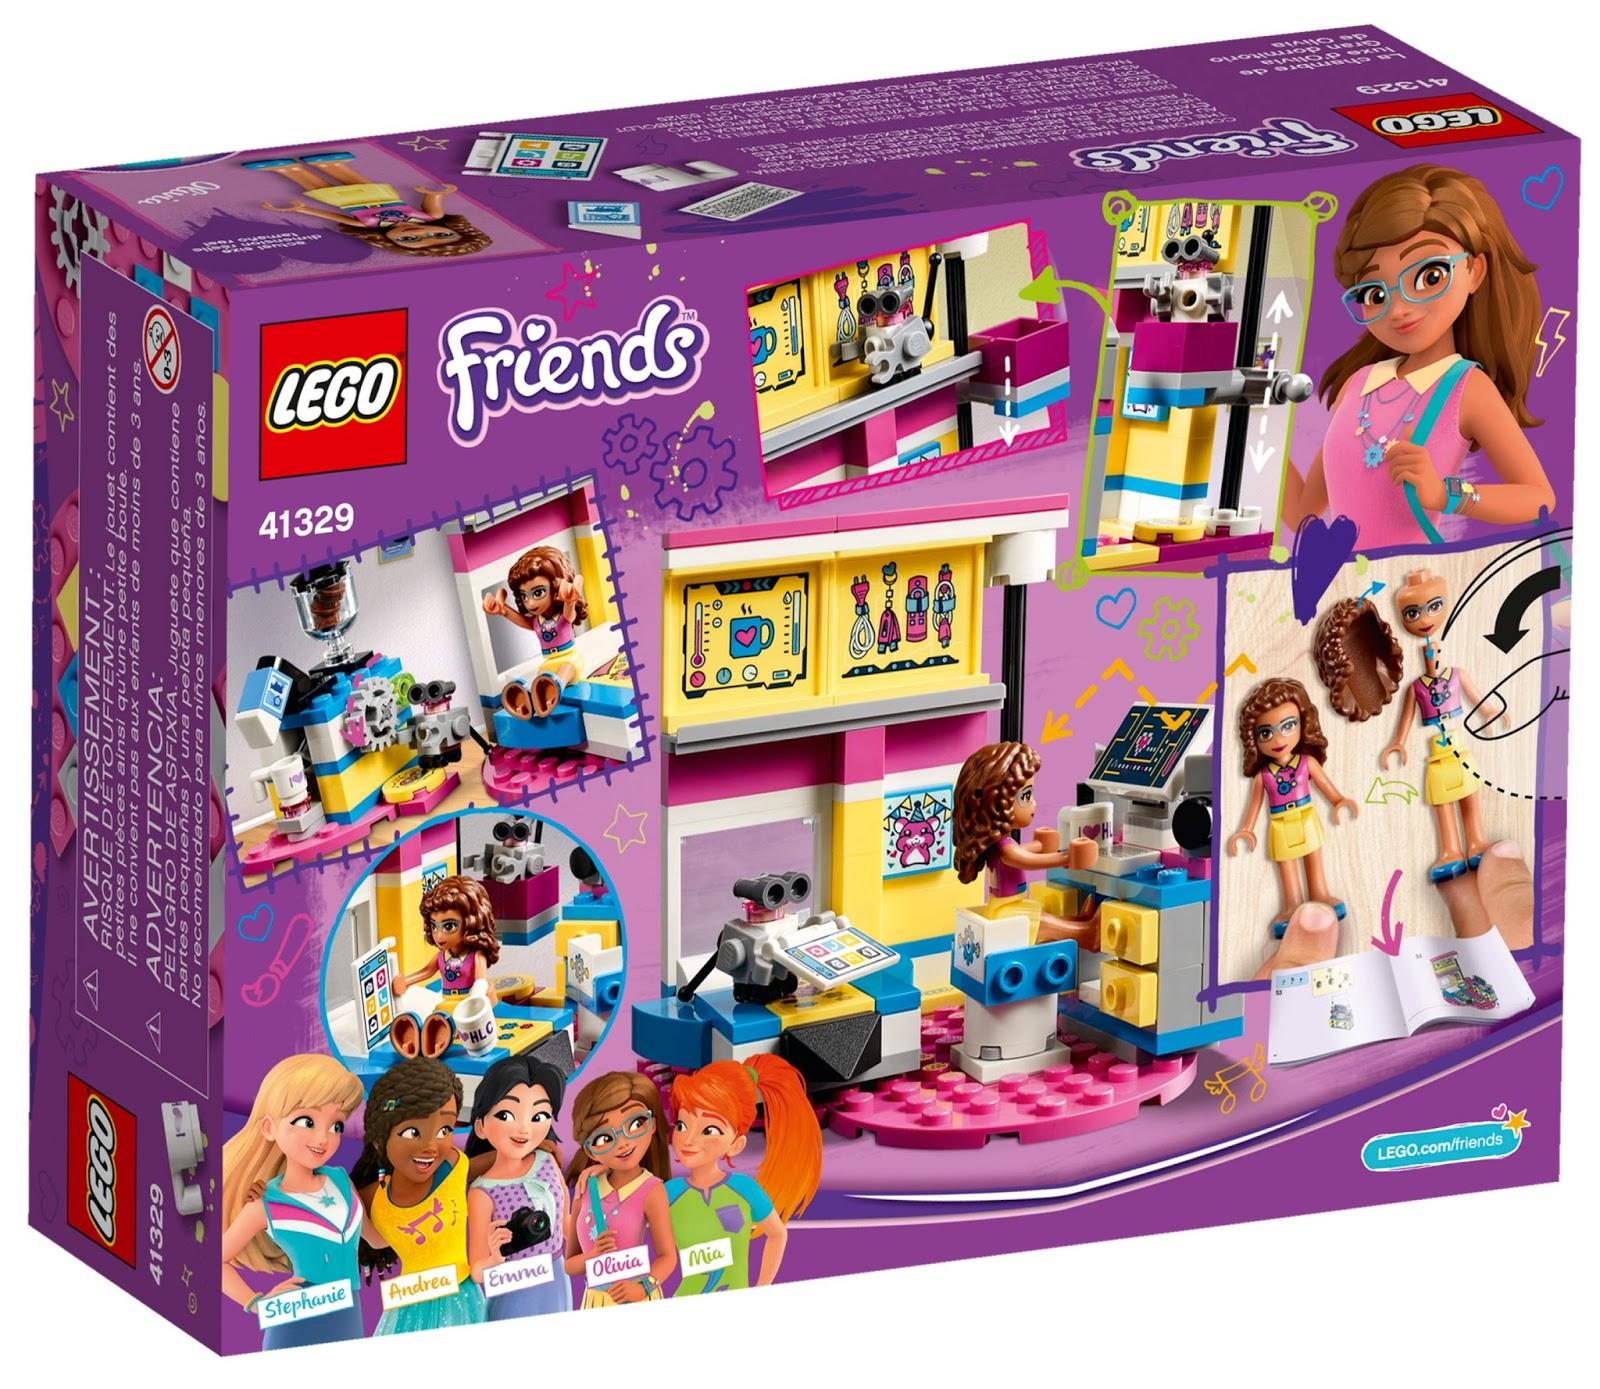 https://3.bp.blogspot.com/-JL7I4JKGC2E/WiQZnN-9kAI/AAAAAAAAFqc/yhMnePHhWGk8SUAWqBzVpTrEkAN-YfpAgCLcBGAs/s1600/Olivia-s-Deluxe-Bedroom-41329-box-back.jpg